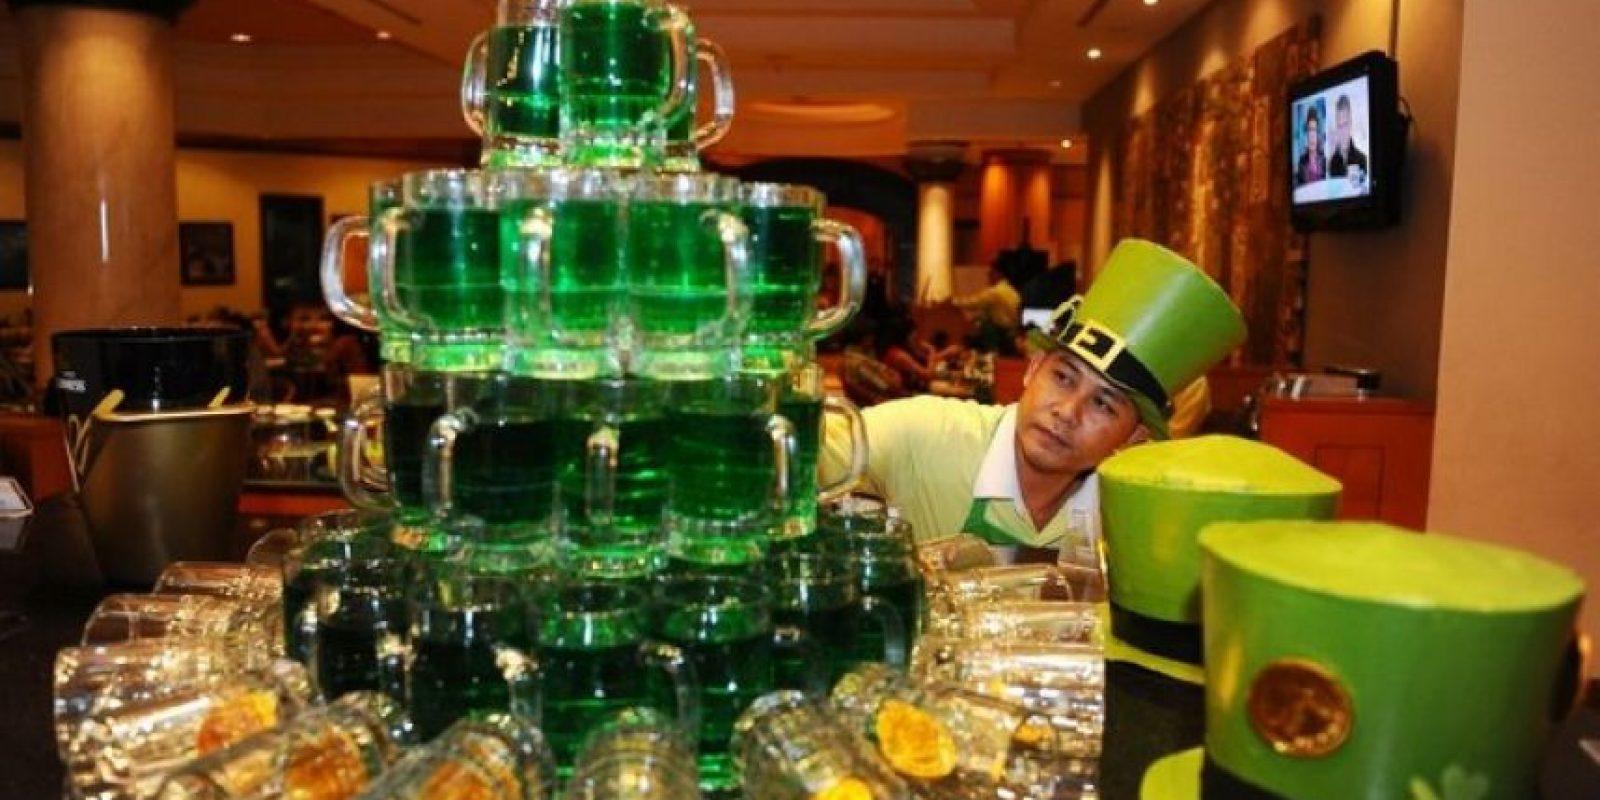 Se consumen 11.7 litros per cápita Foto:Getty Images